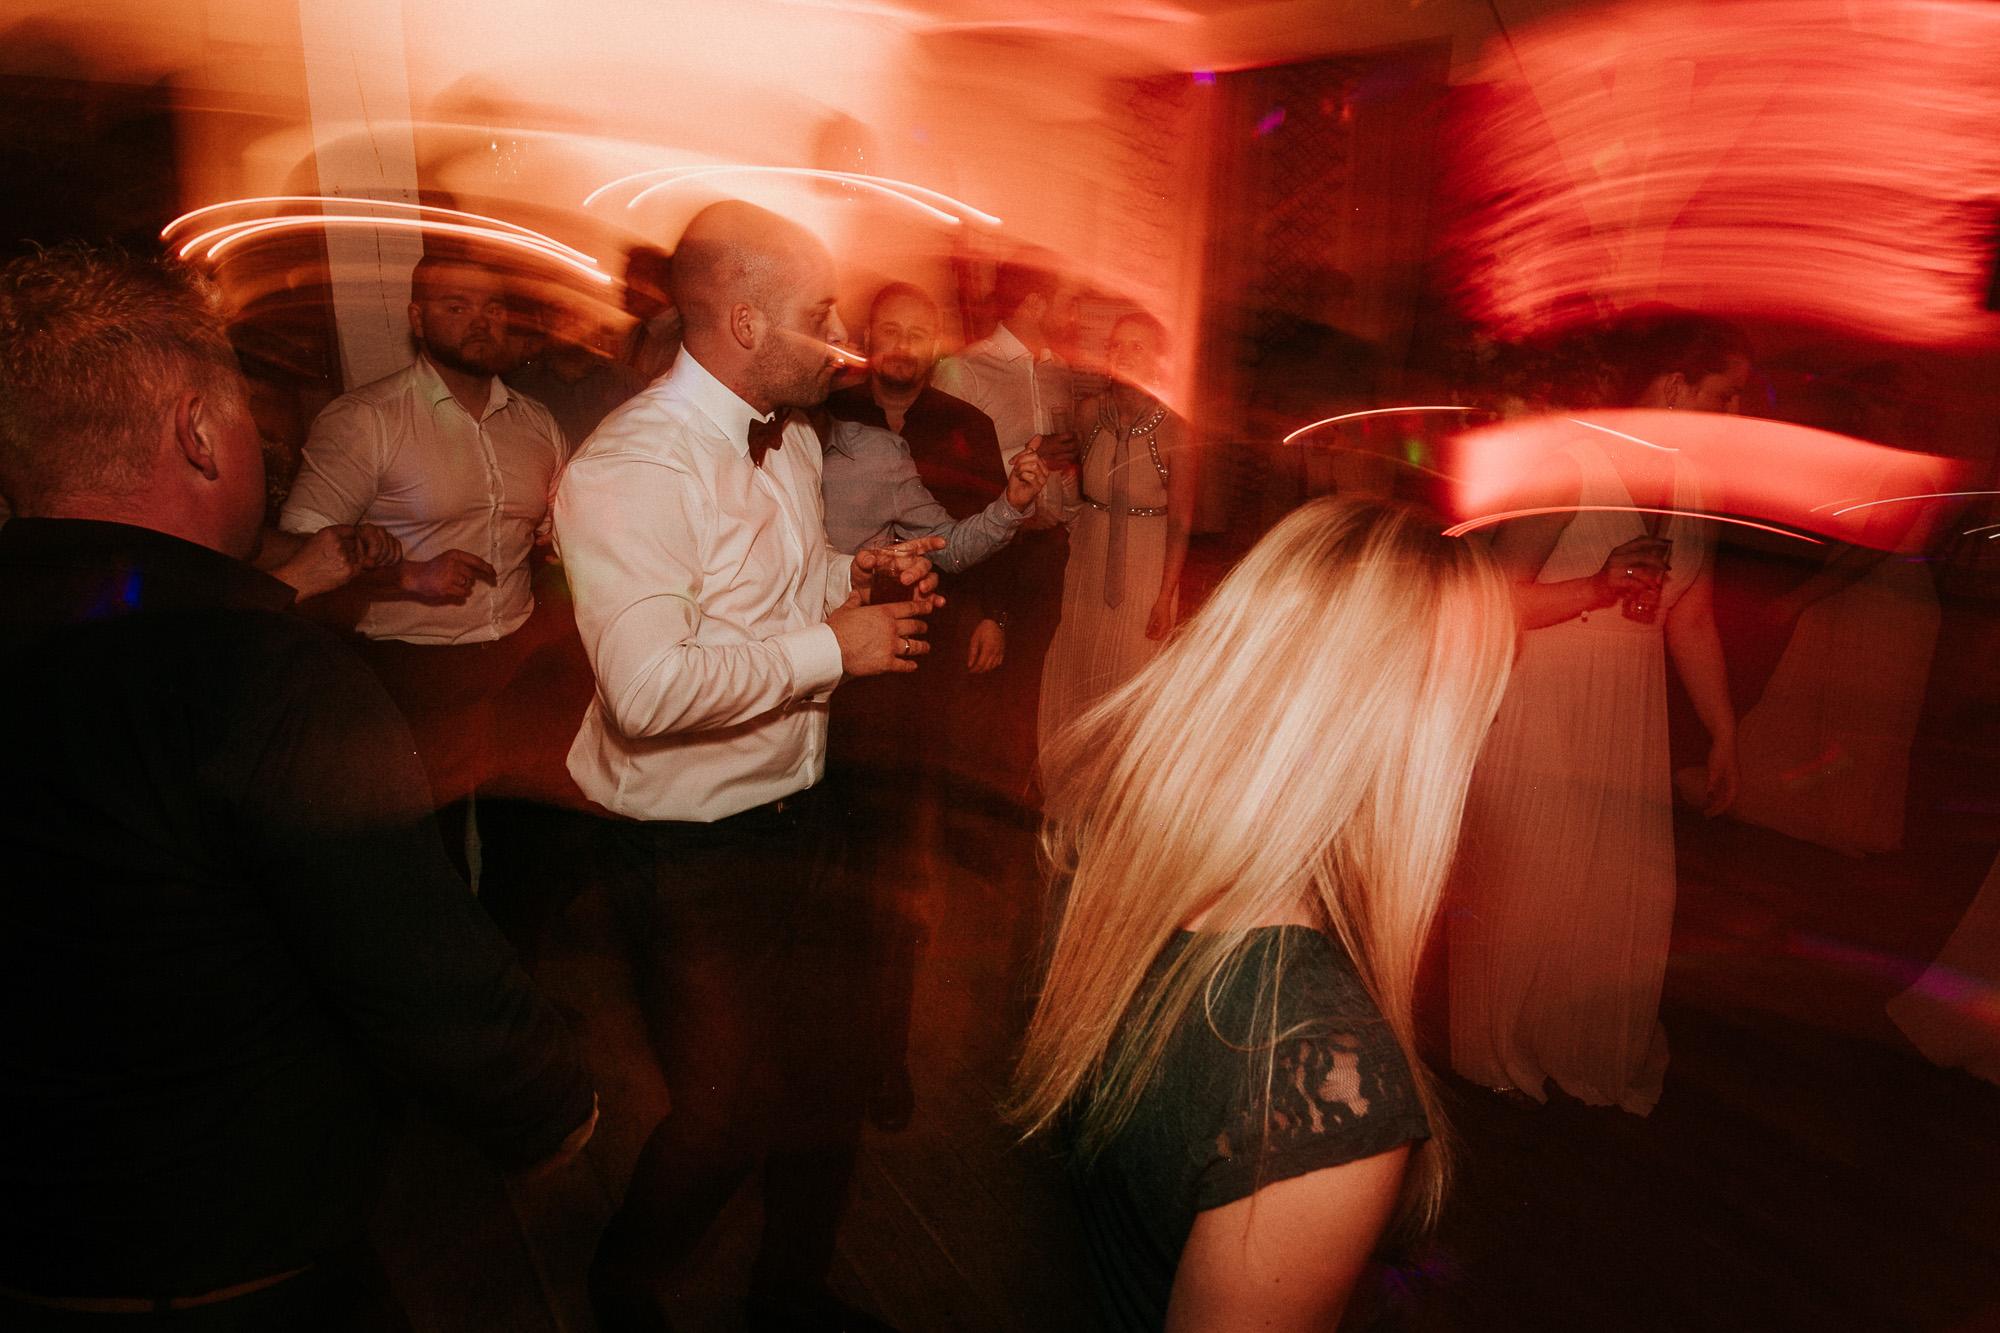 DanielaMarquardtPhotography_Hochzeitsfotograf_Düsseldorf_Köln_Mallorca_Bayern_Austria_Harz_Wedding_AileenundLennart_Weddingphotographer_Ibiza_Tuskany_Italien_Toskana_Portugal_Lissabon285